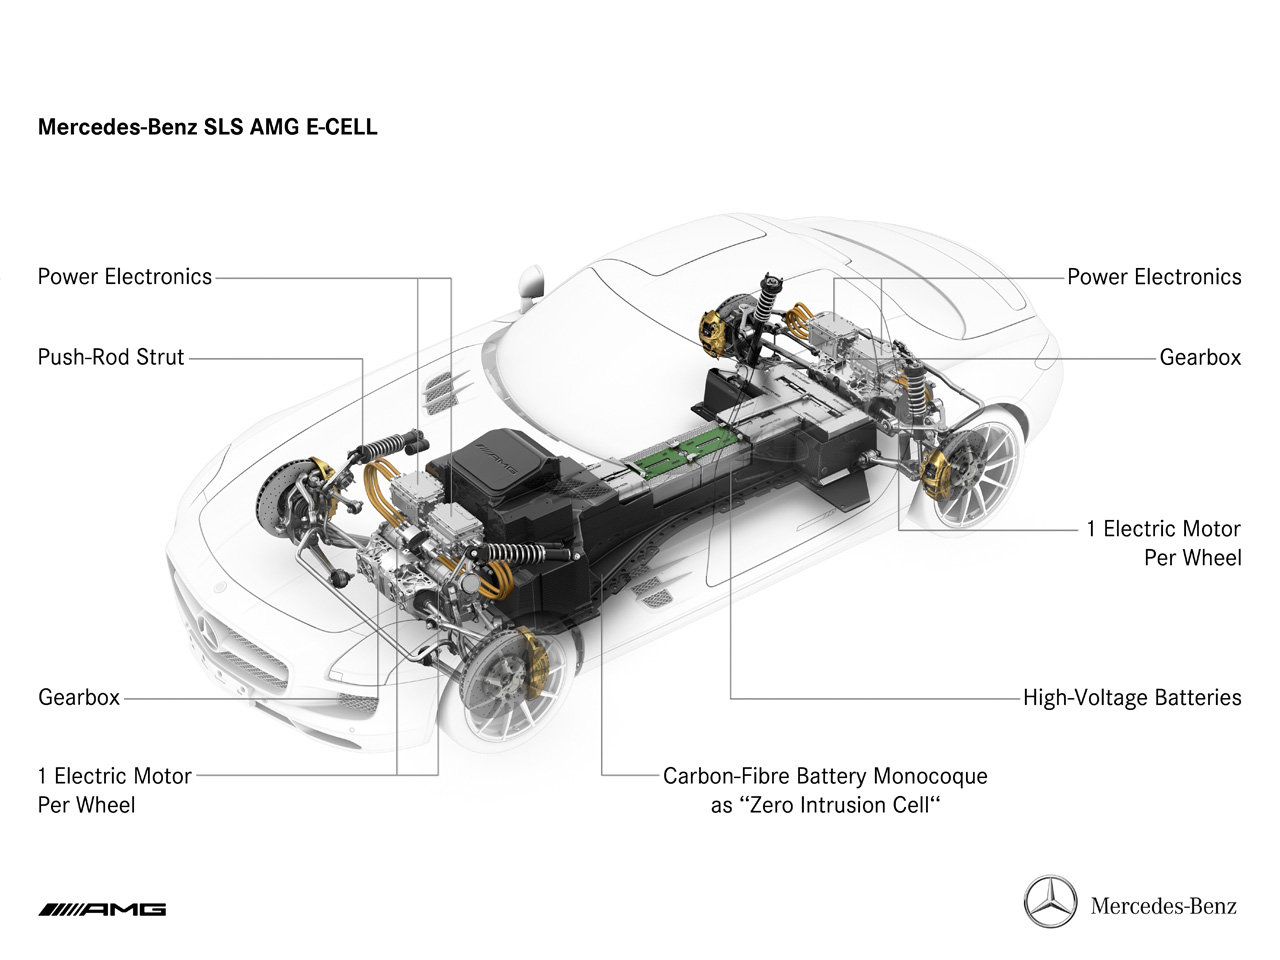 Mercedes Confirma Las Caracteristicas Del Sls Electrico